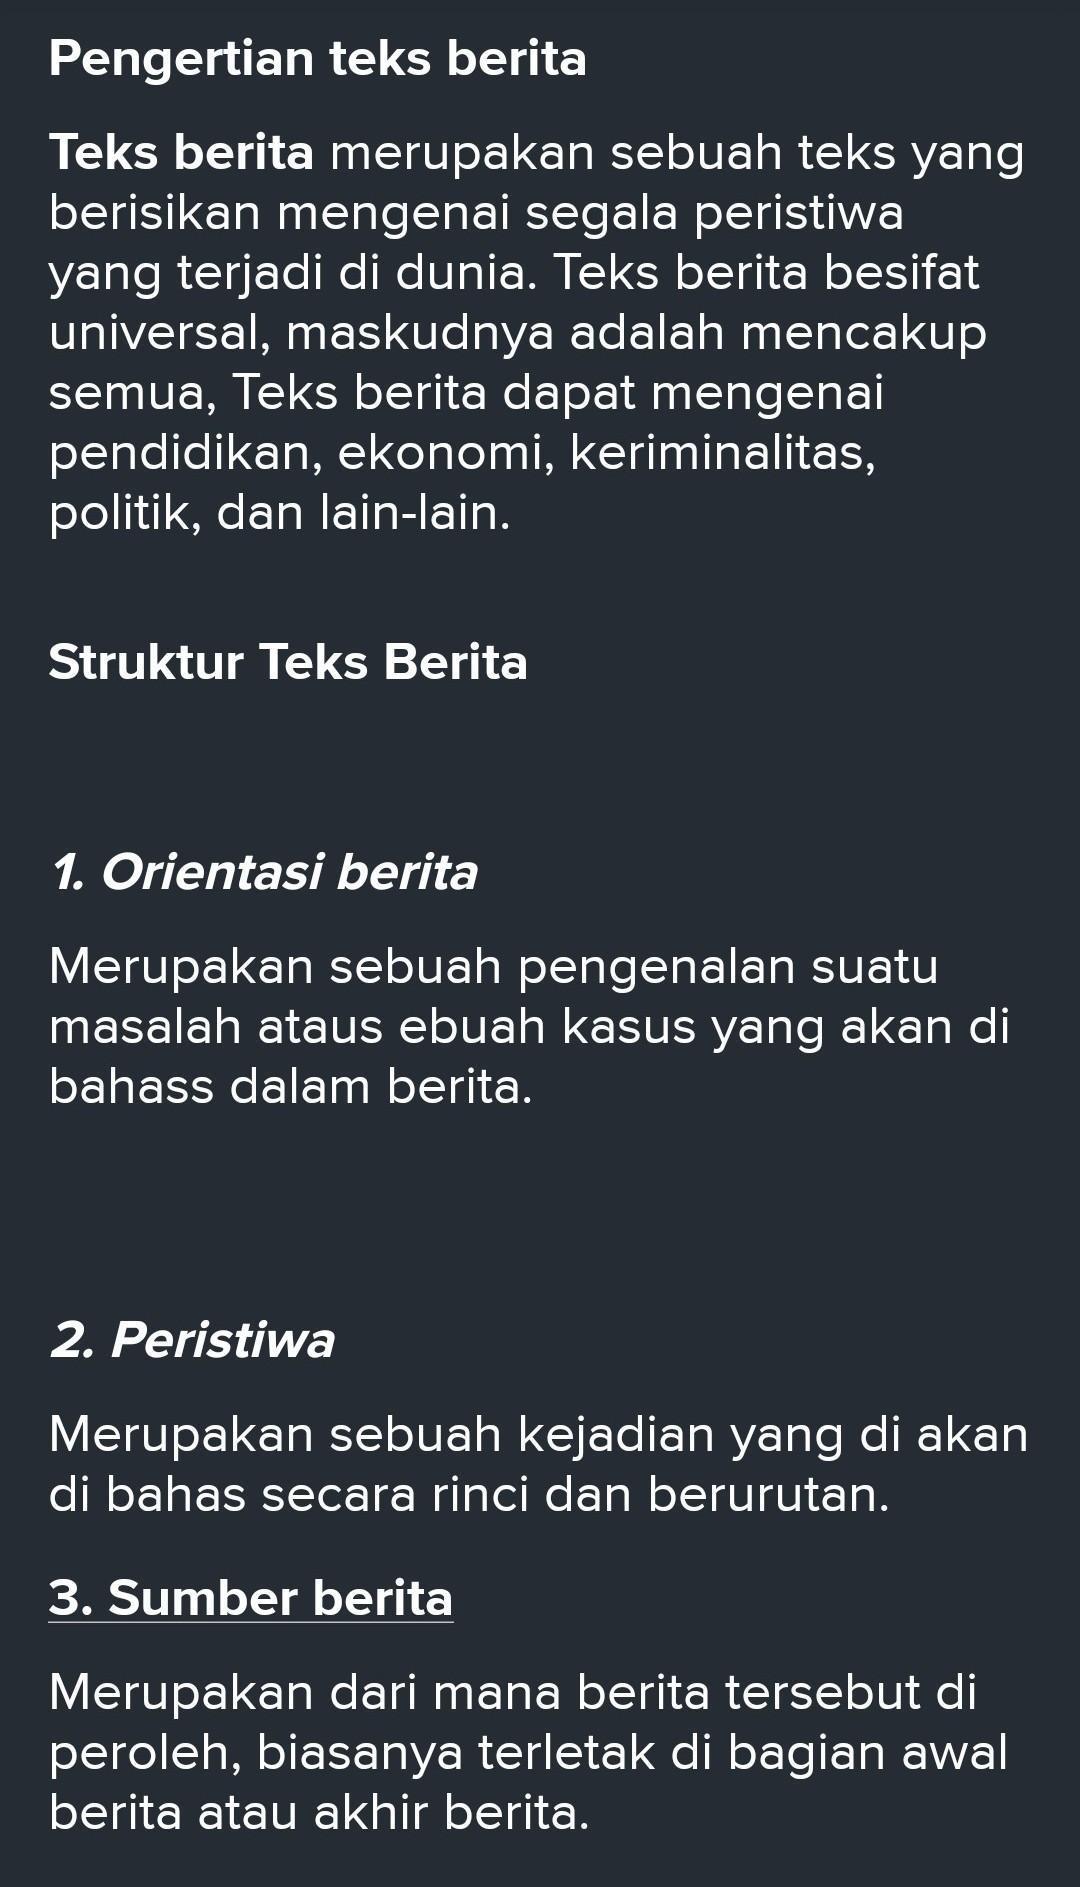 Struktur Teks Berita : struktur, berita, Sebut, Jelaskan, Struktur, Berita, Brainly.co.id